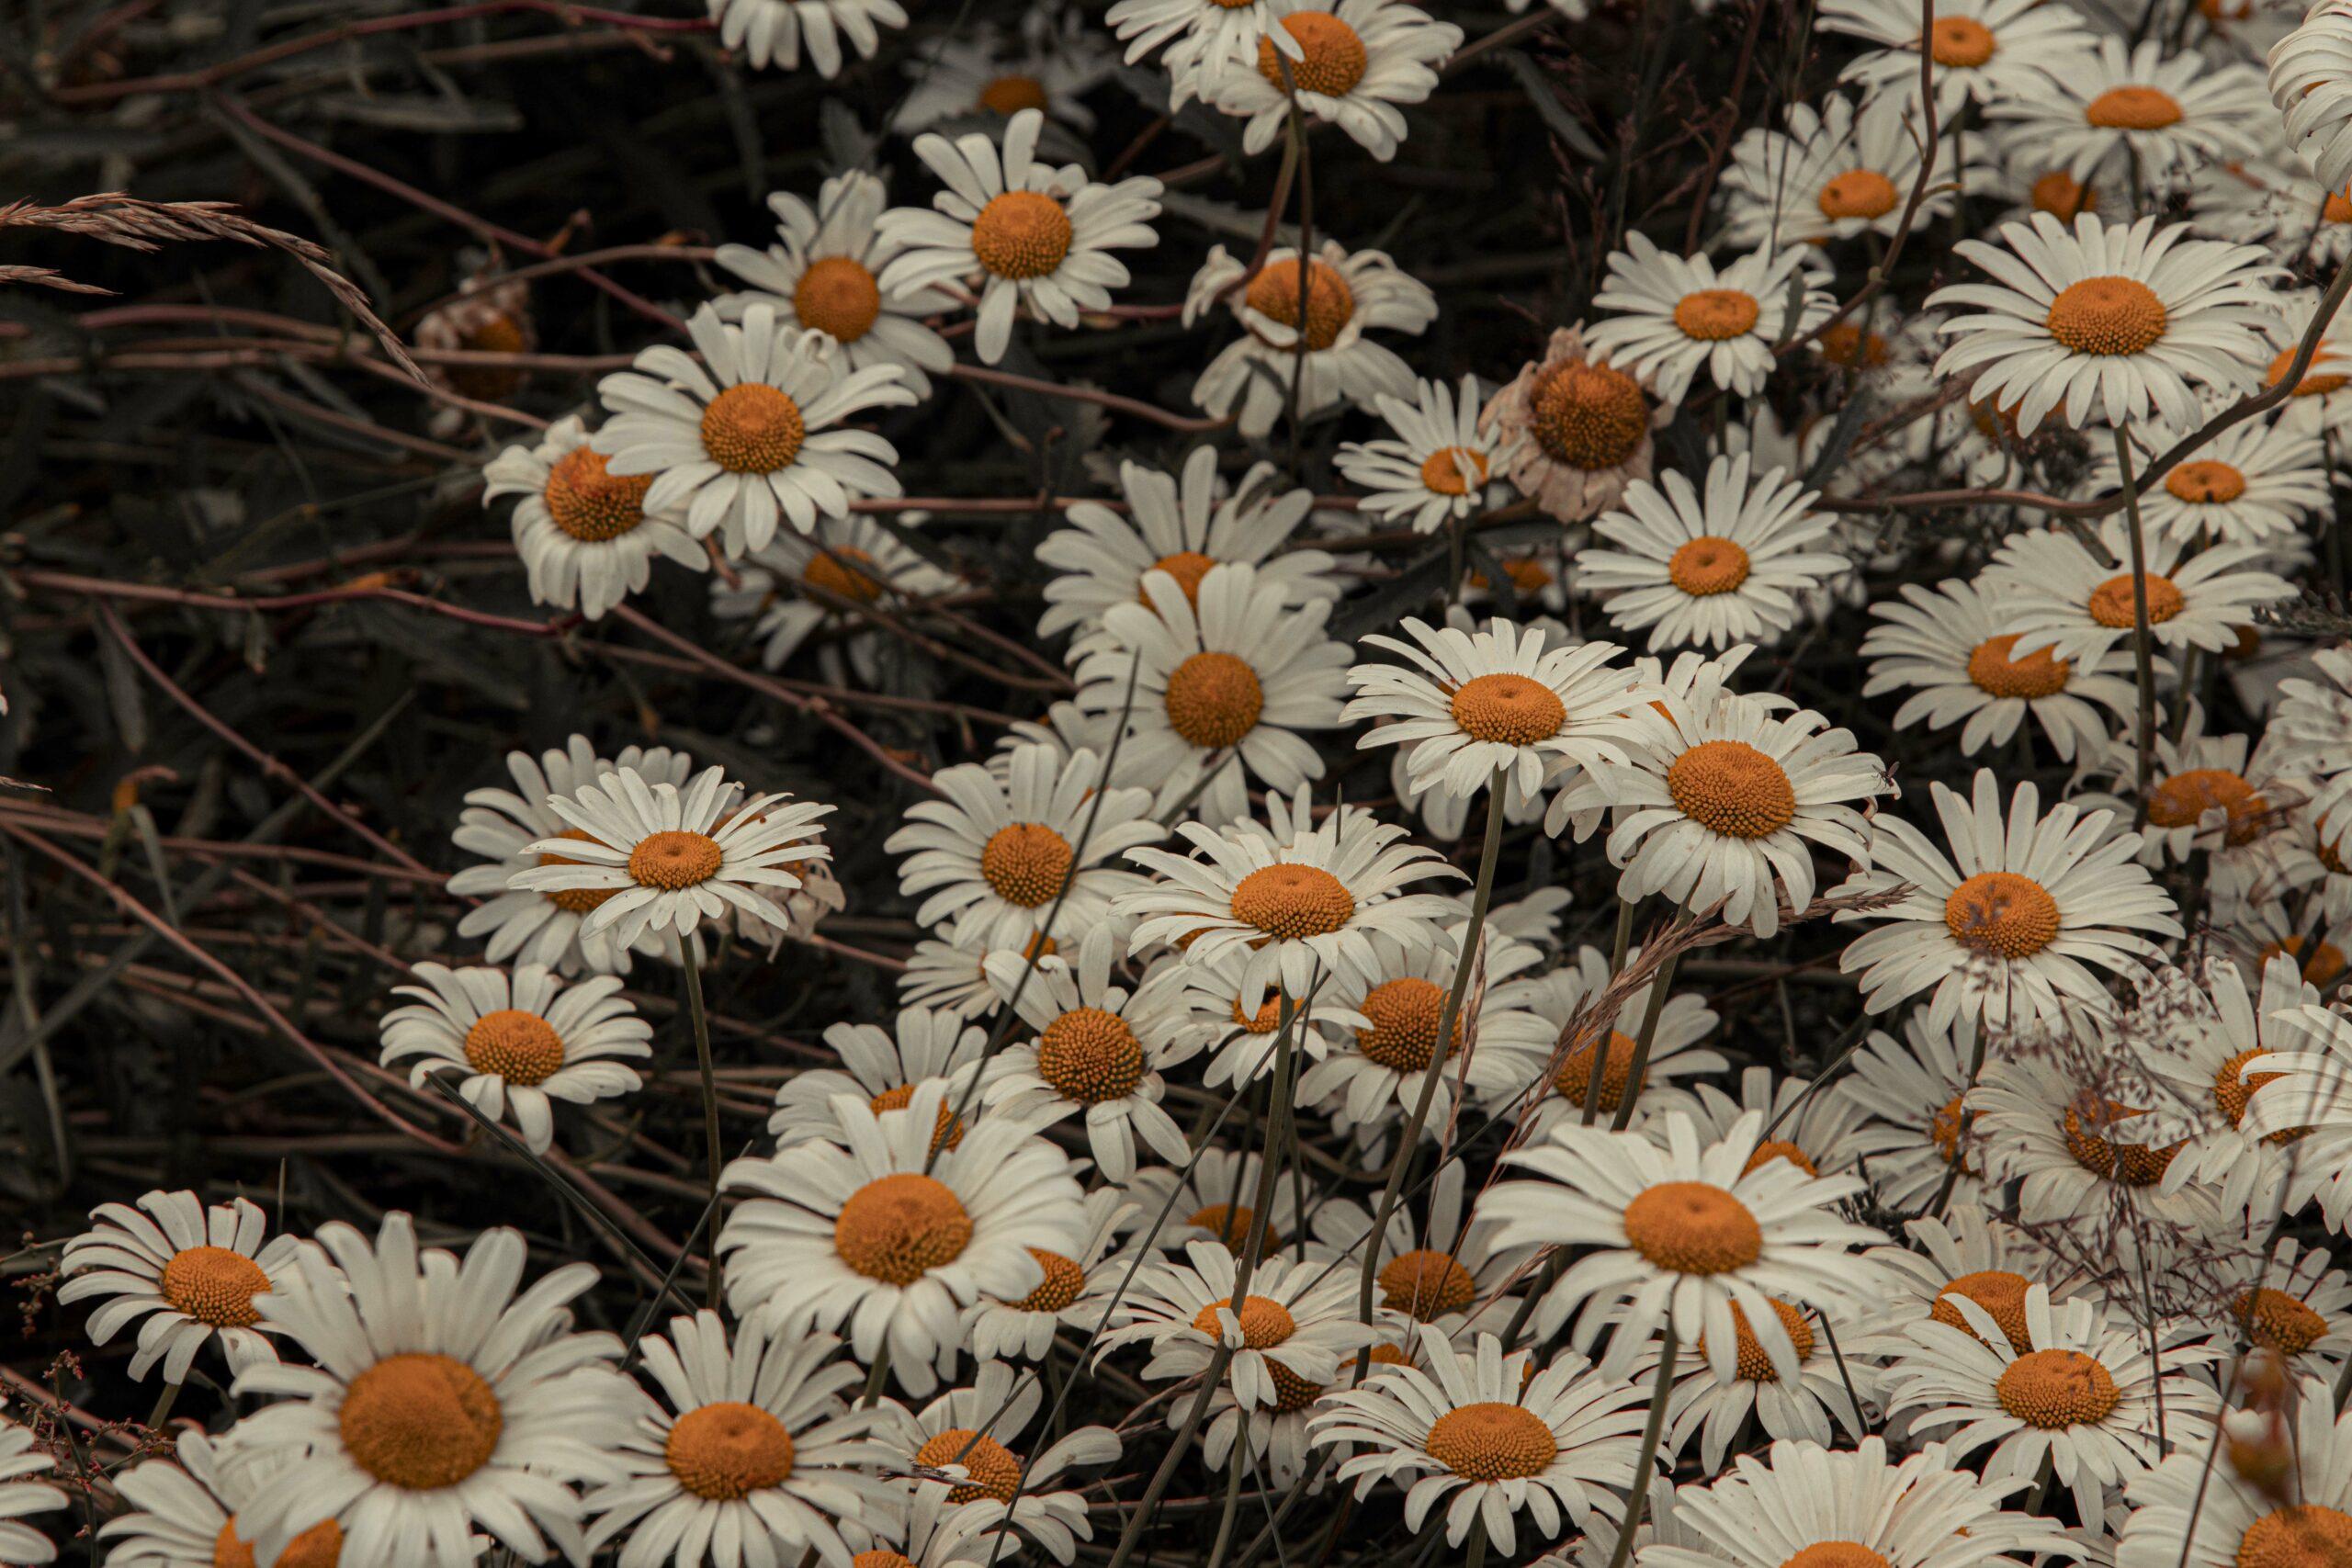 group of daisies dark and moody